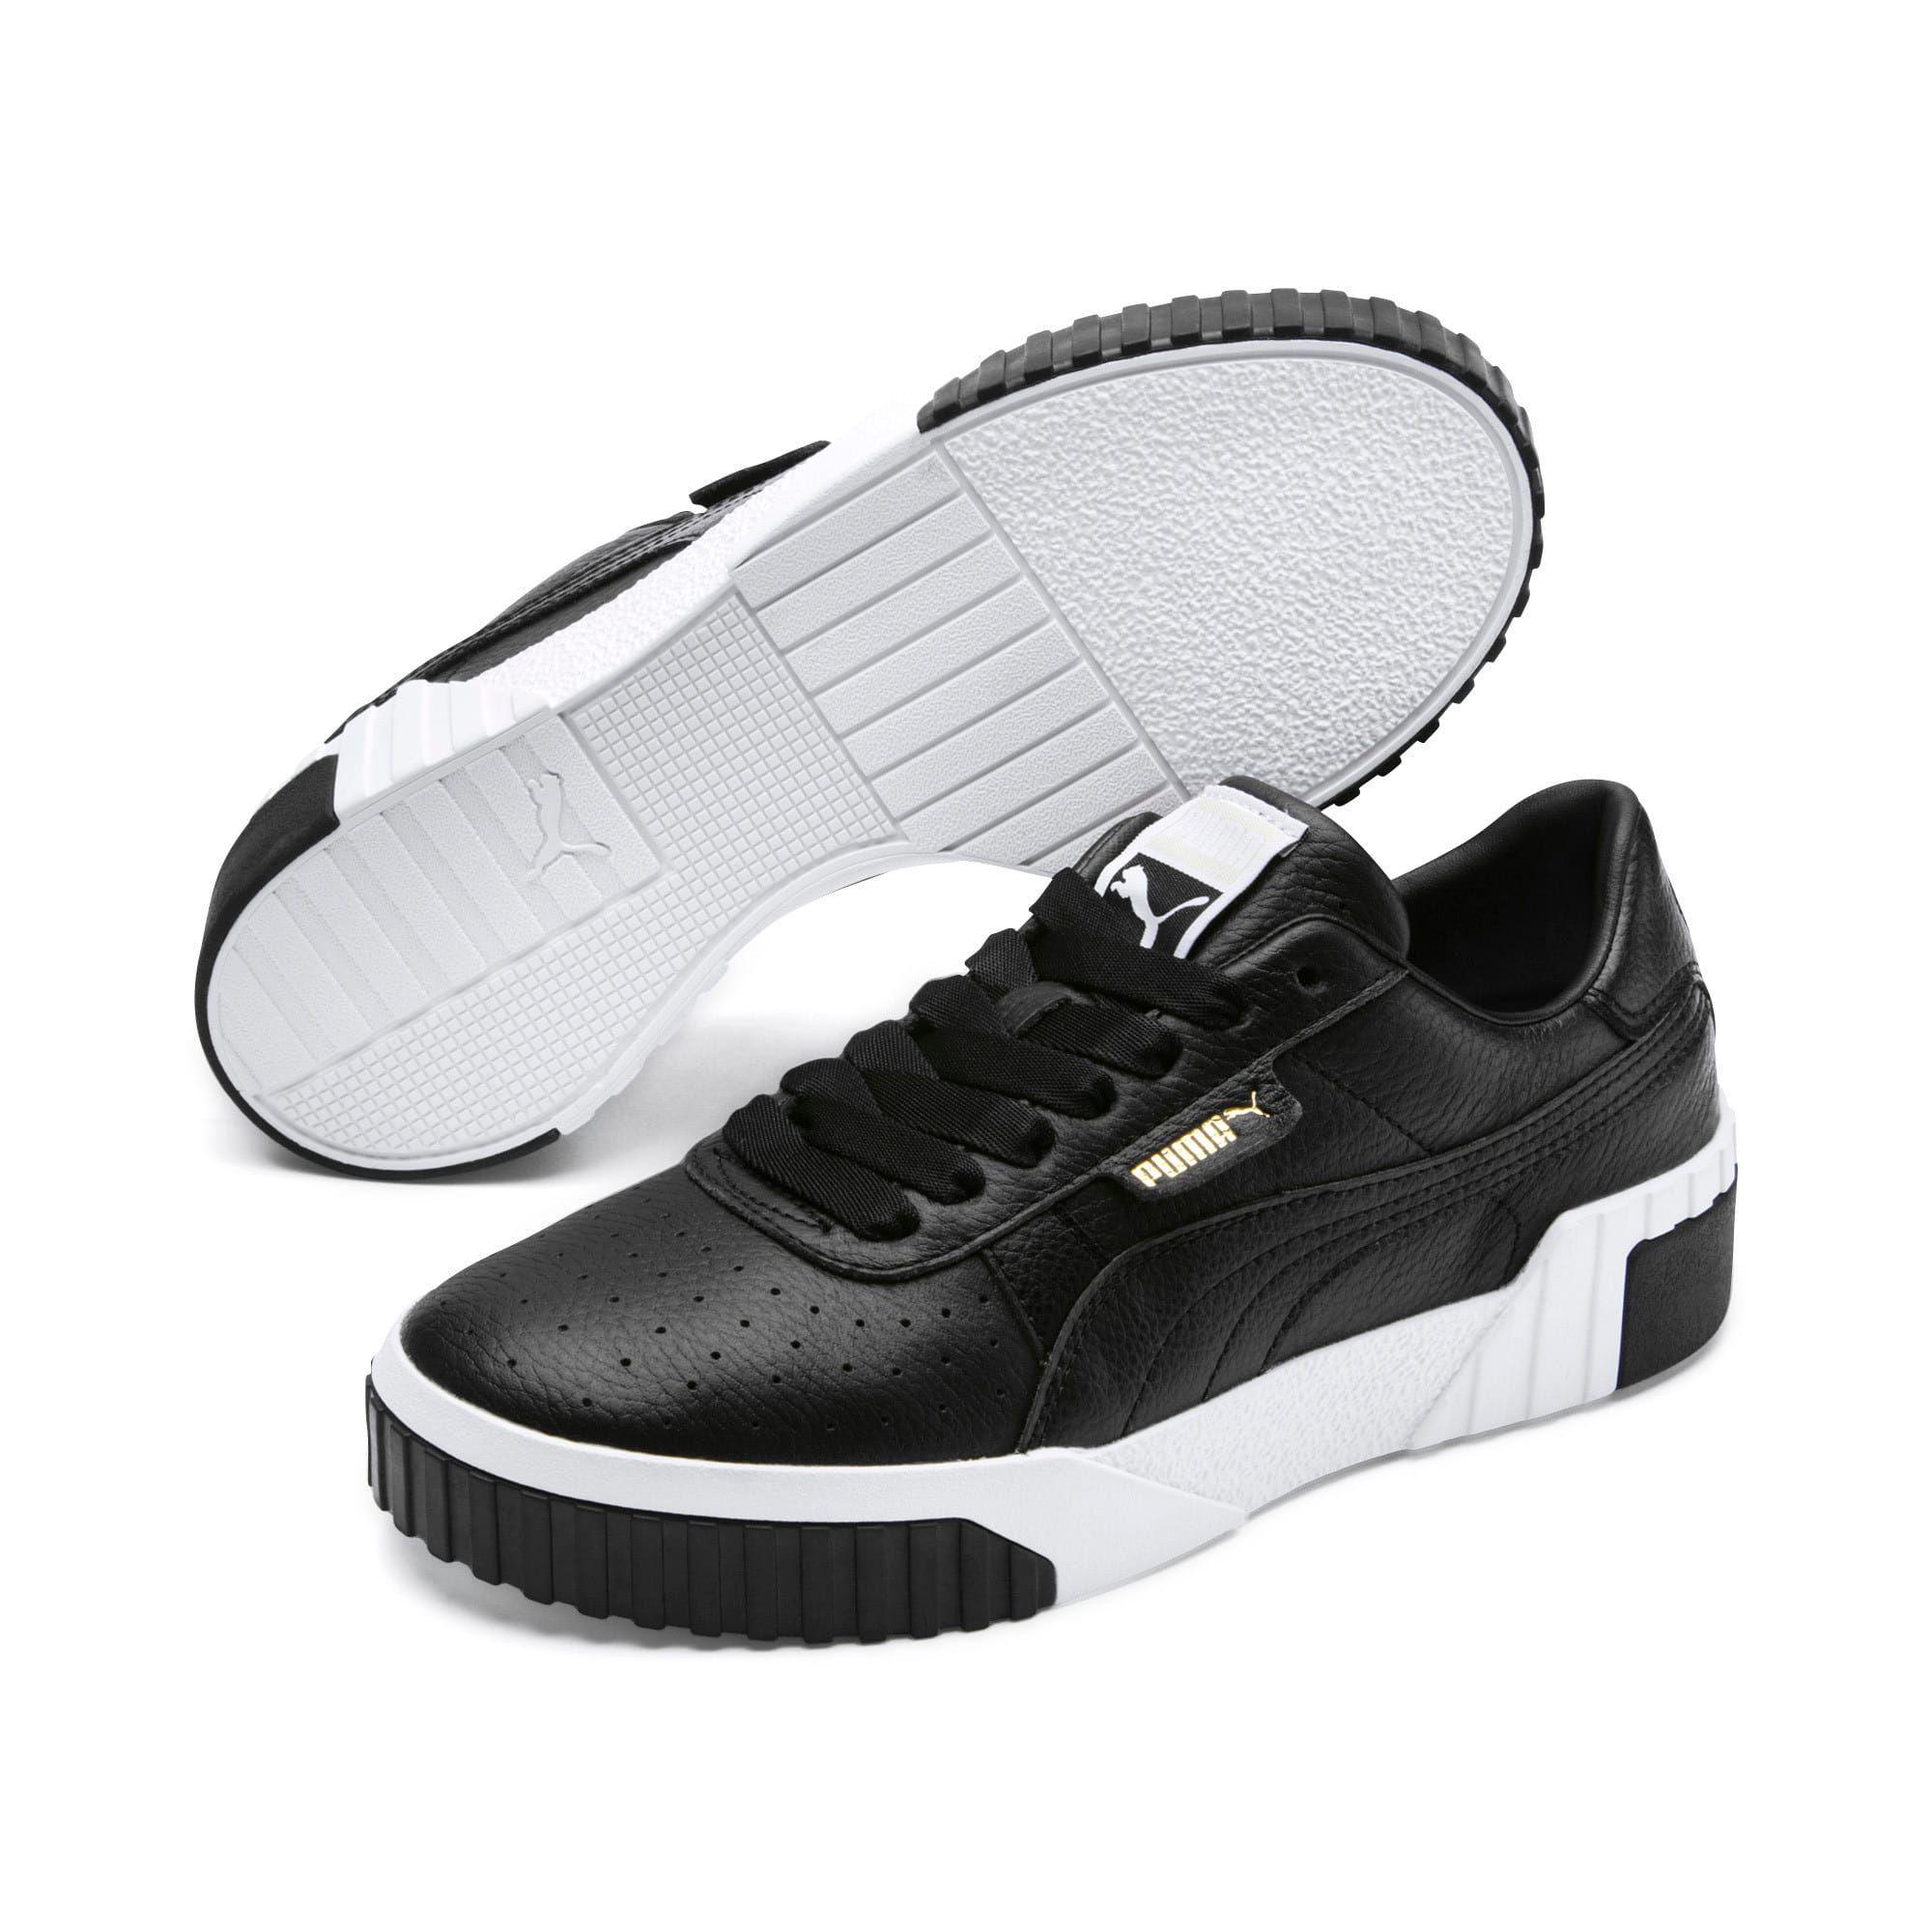 Cali Women S Trainers In 2020 Sneakers Sneakers Fashion Best Sneakers